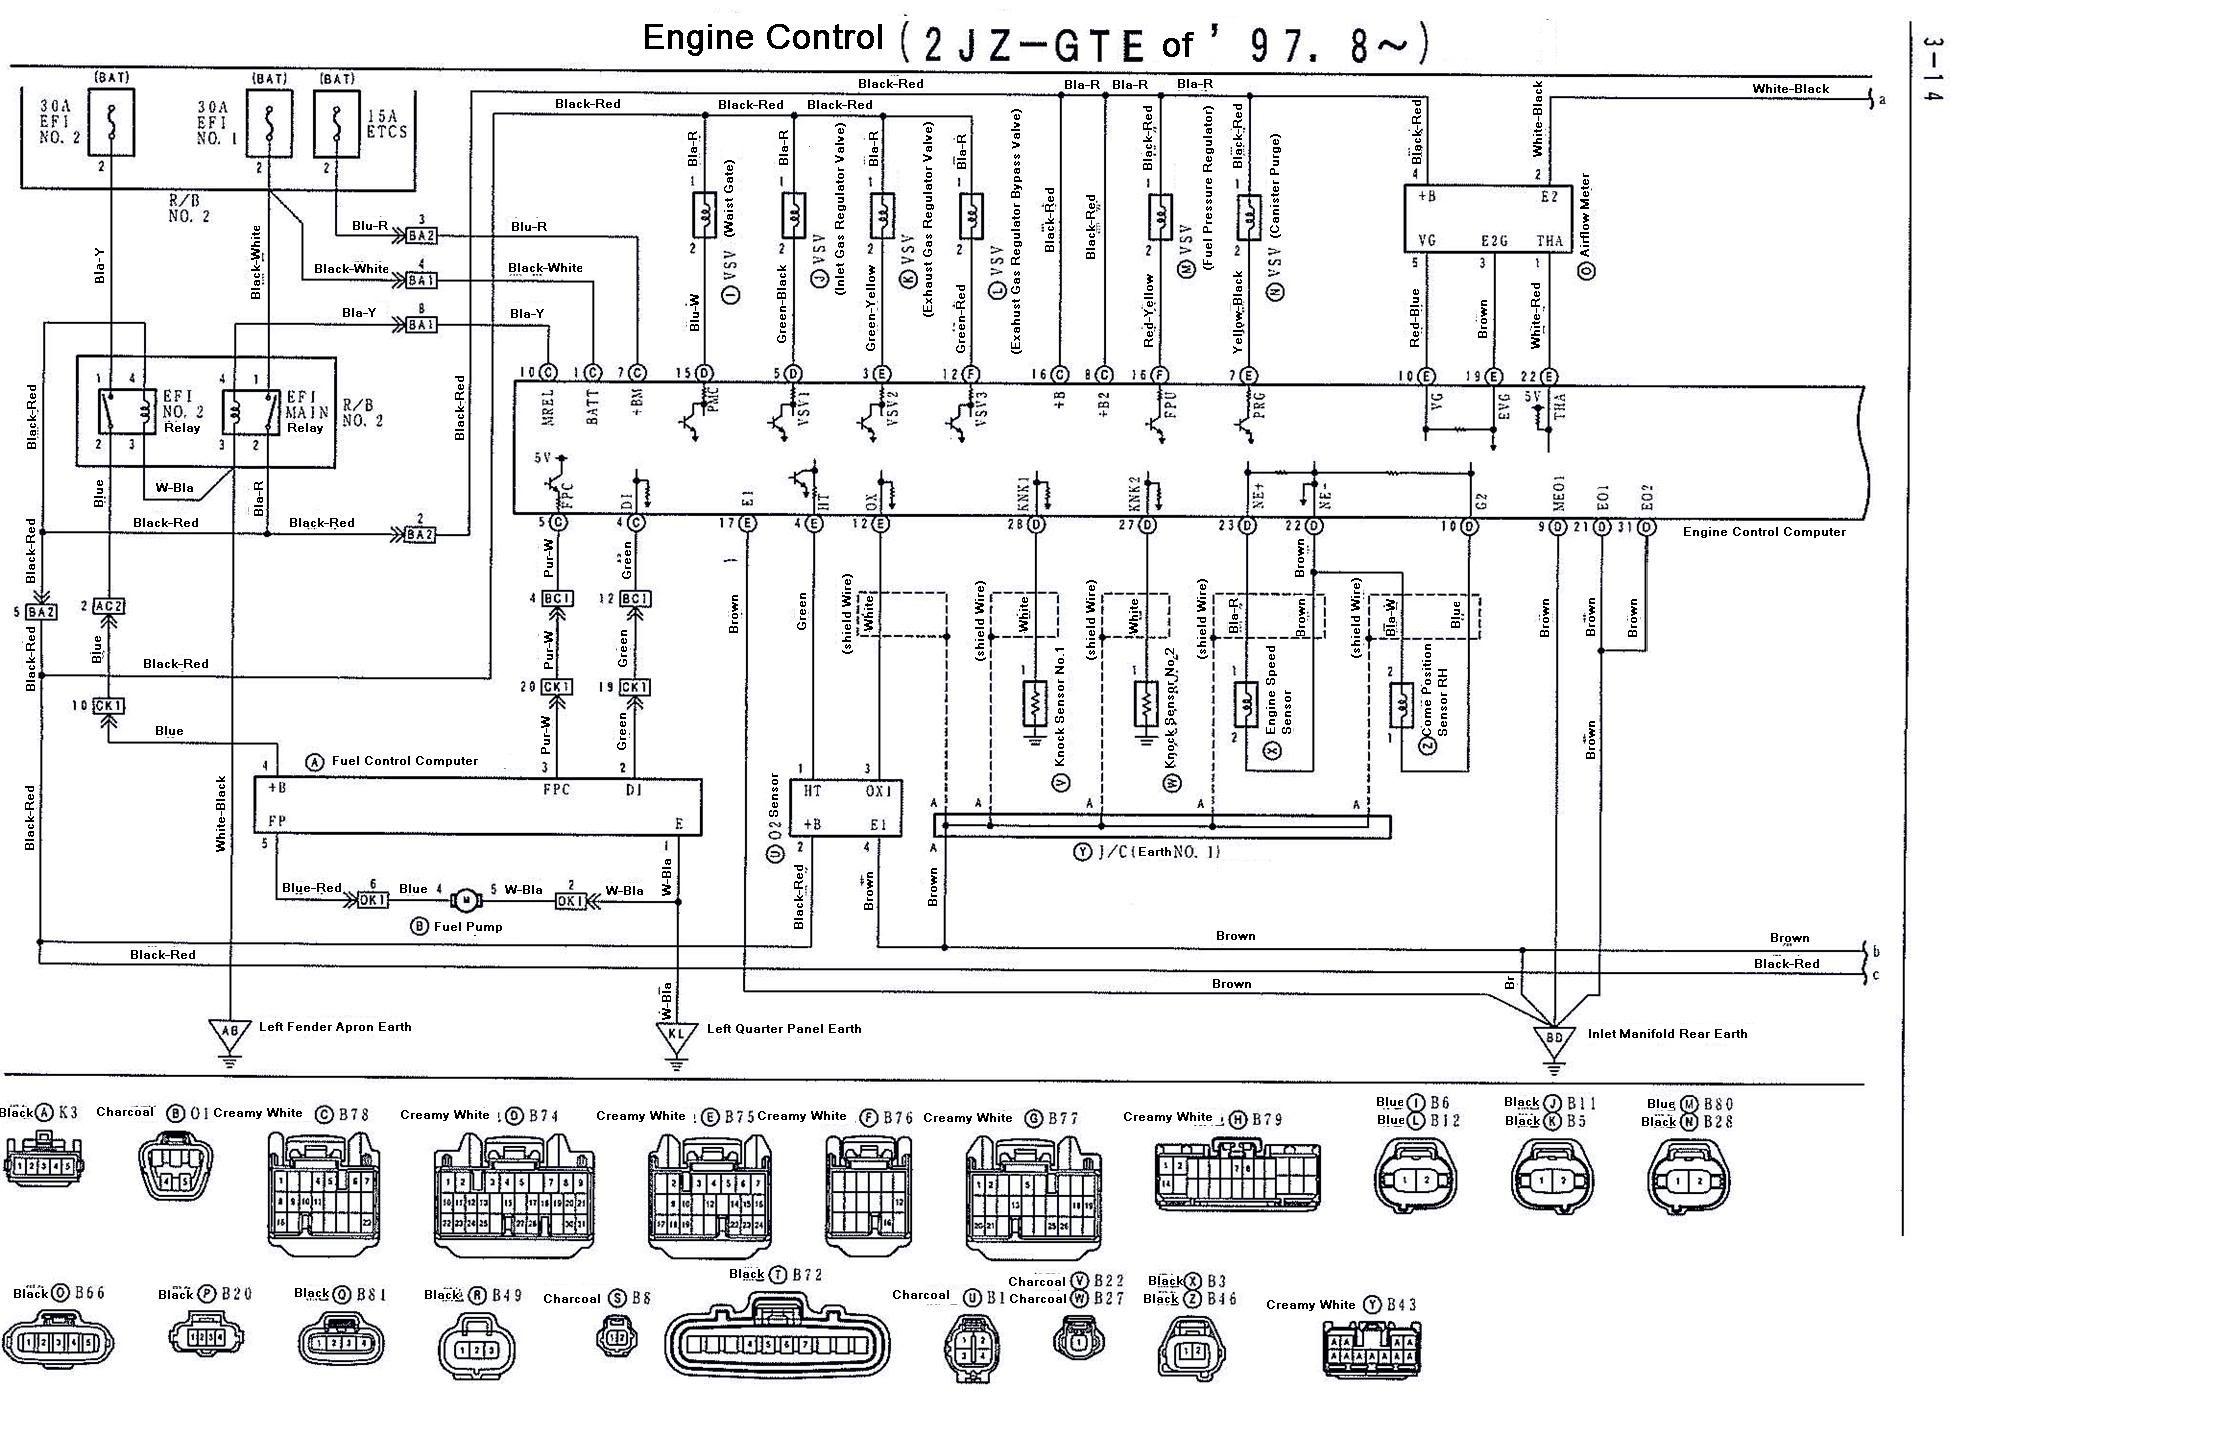 2jzgte vvti wiring diagrams and ecu pinouts 2jzgte wiring diagram 2jz gte wiring diagram i224 photobucket